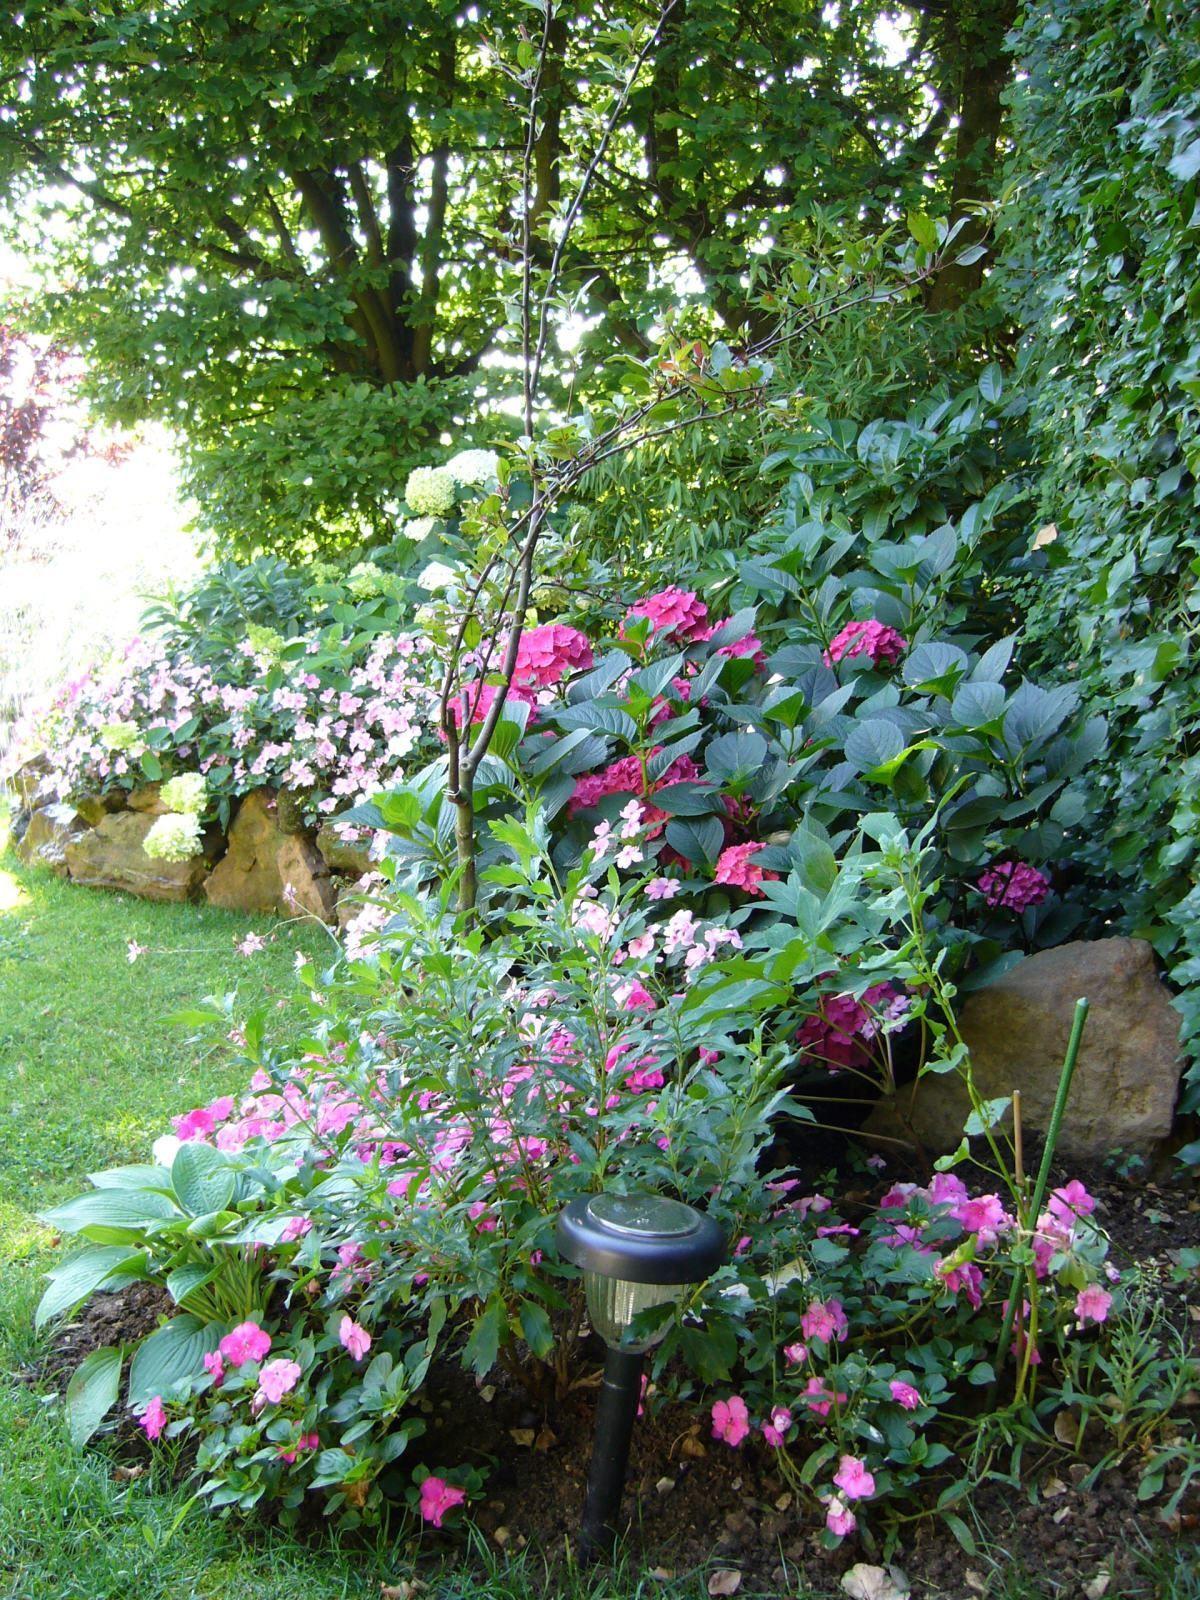 Paysagiste toucy fp paysages lagage am nagement for Entretien jardin 86